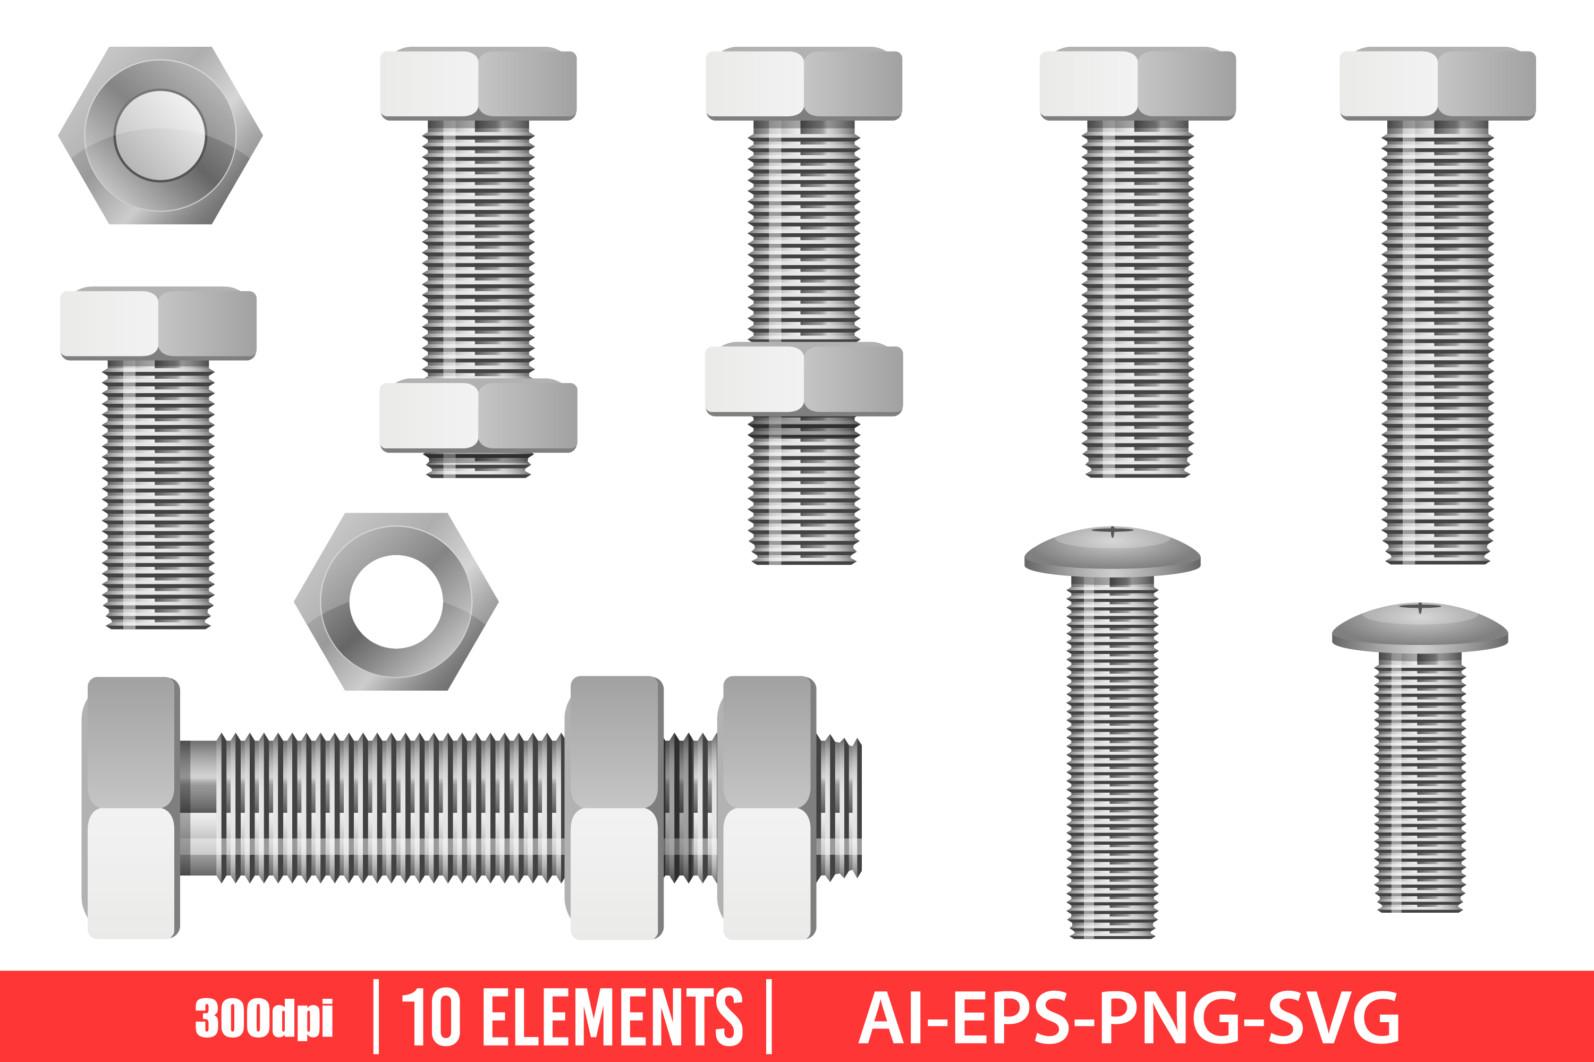 Hex bolt clipart vector design illustration. Hex bolt set. Vector Clipart Print - HEX BOLT scaled -